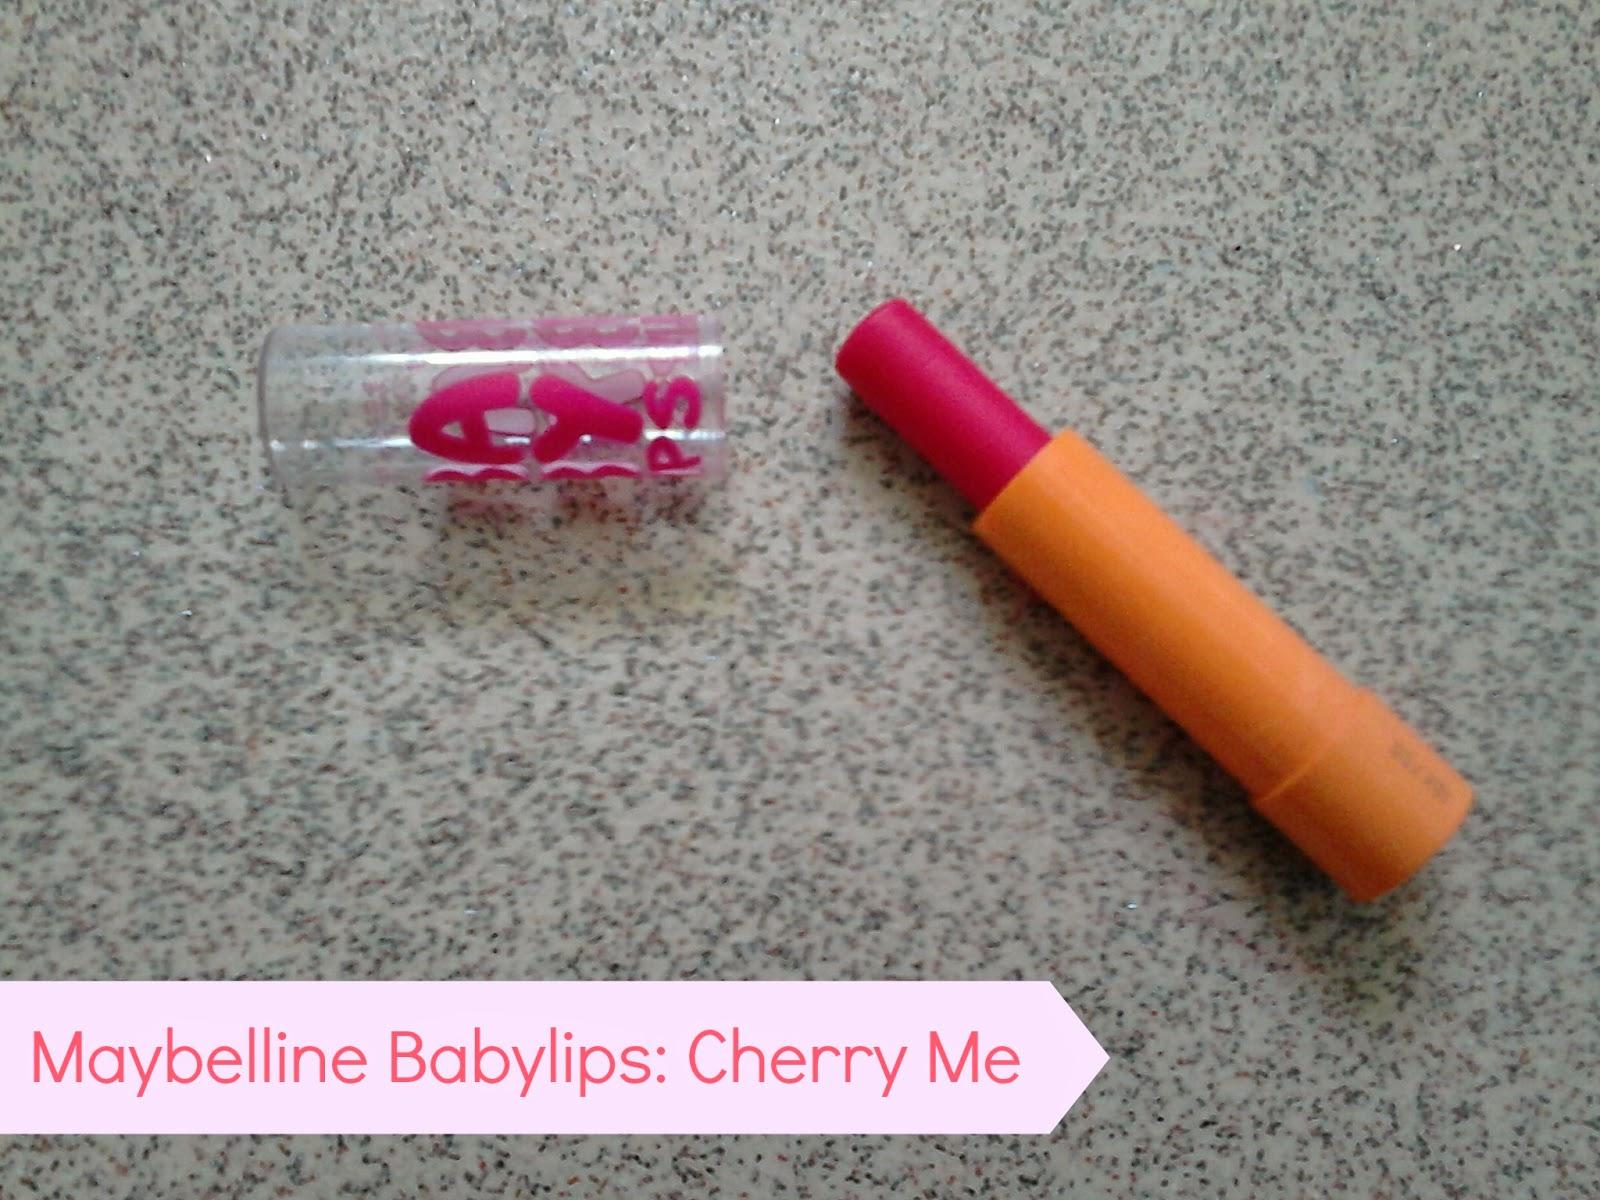 Maybelline Babylips Cherry Me